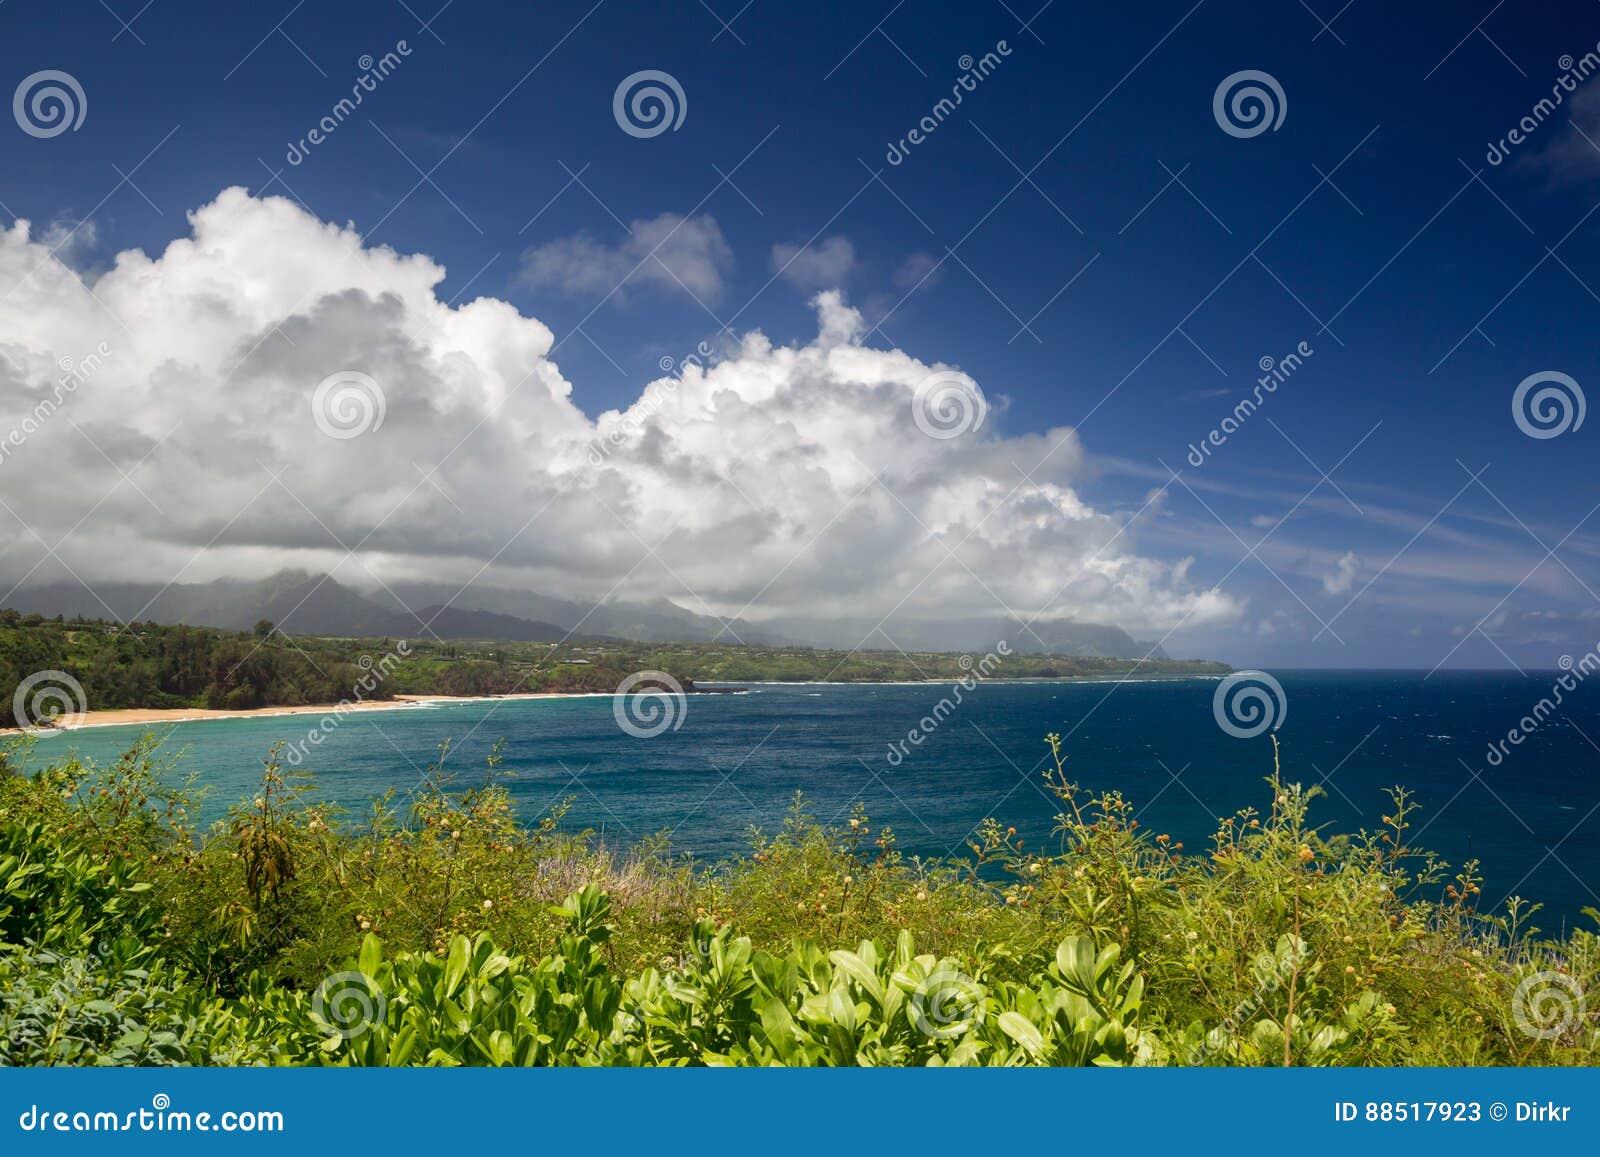 North coast of Kauai